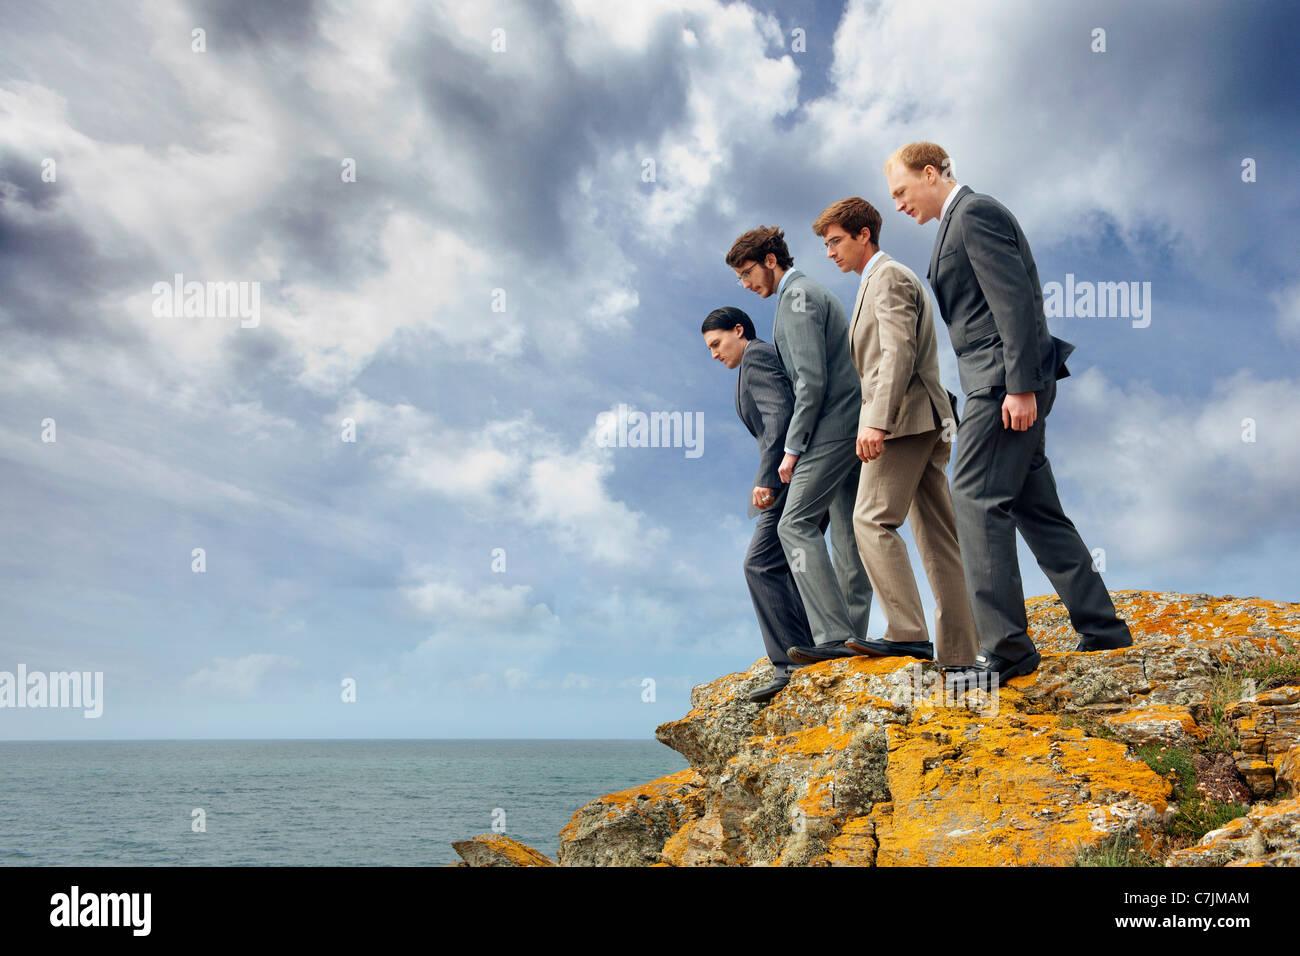 Businessmen peering over cliff edge - Stock Image